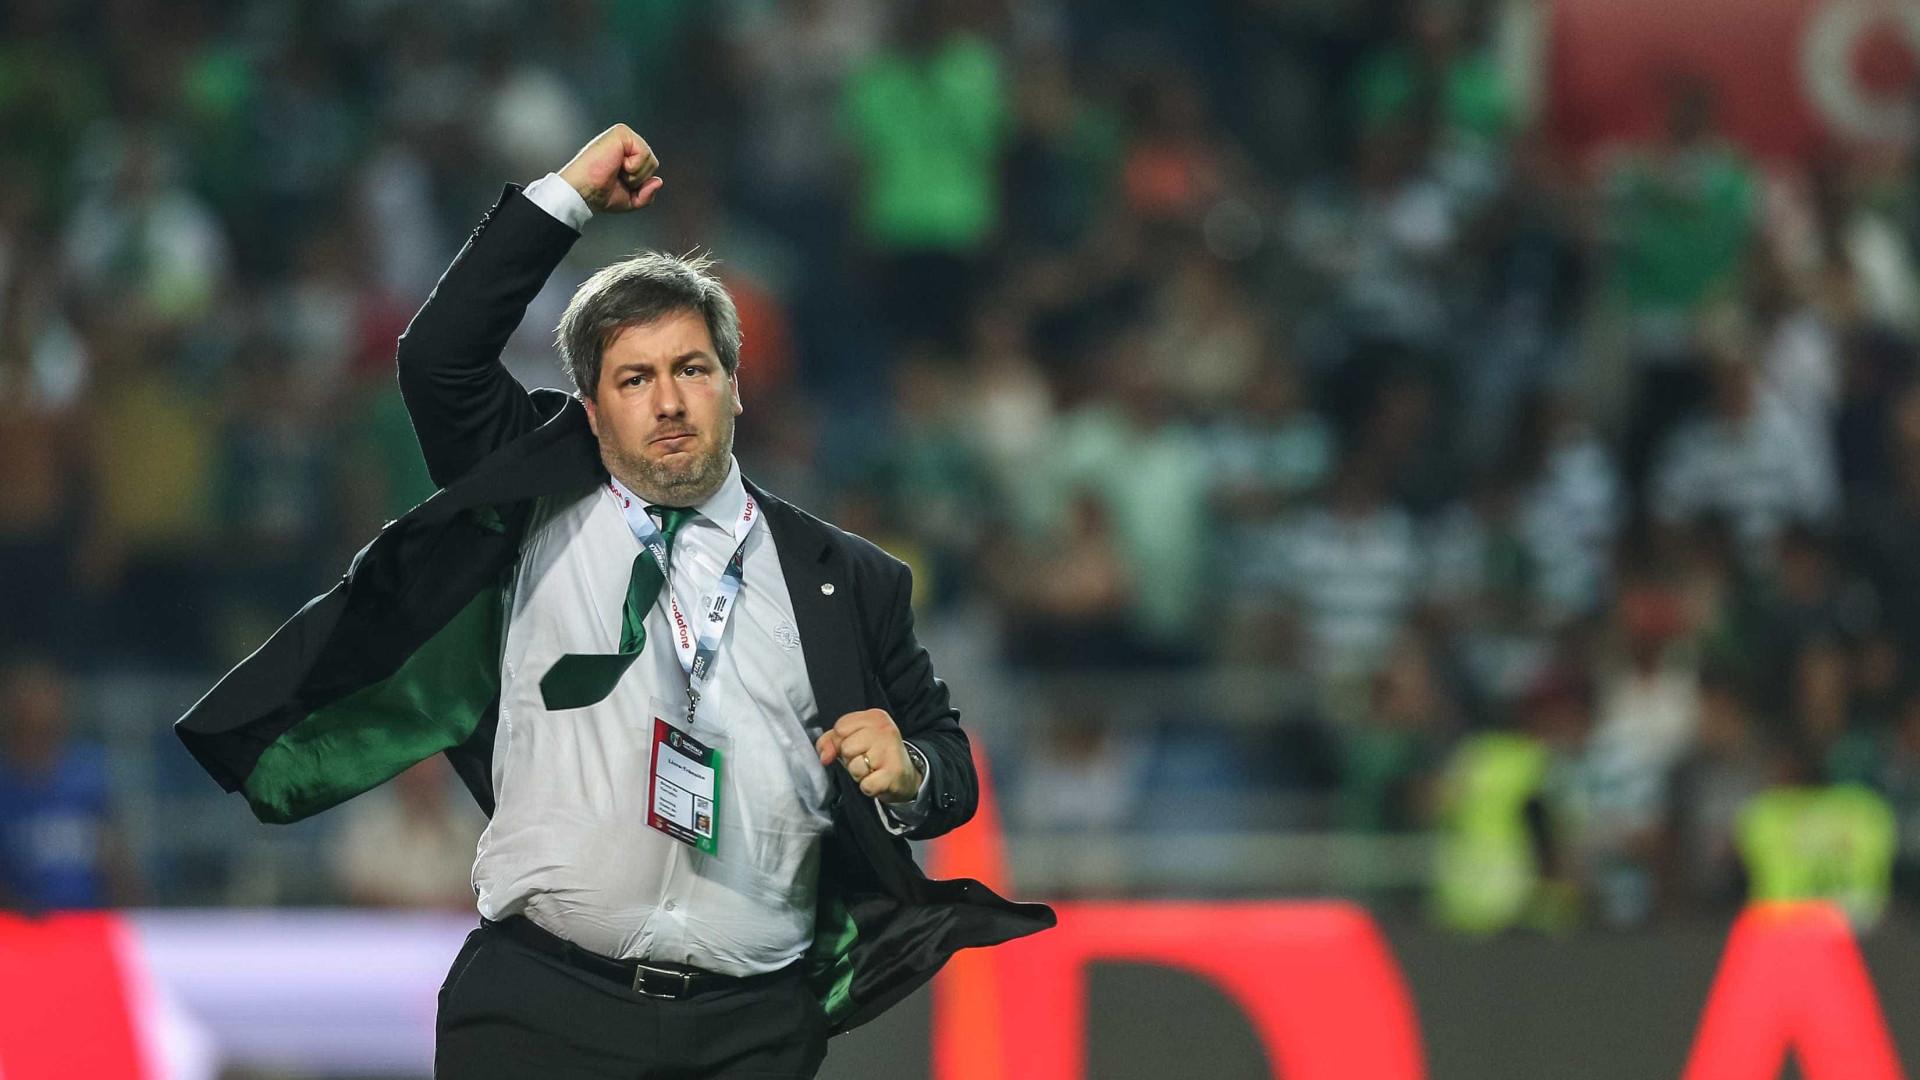 Presidente do Sporting voltou a picar o rival FC Porto 643299e6accb1